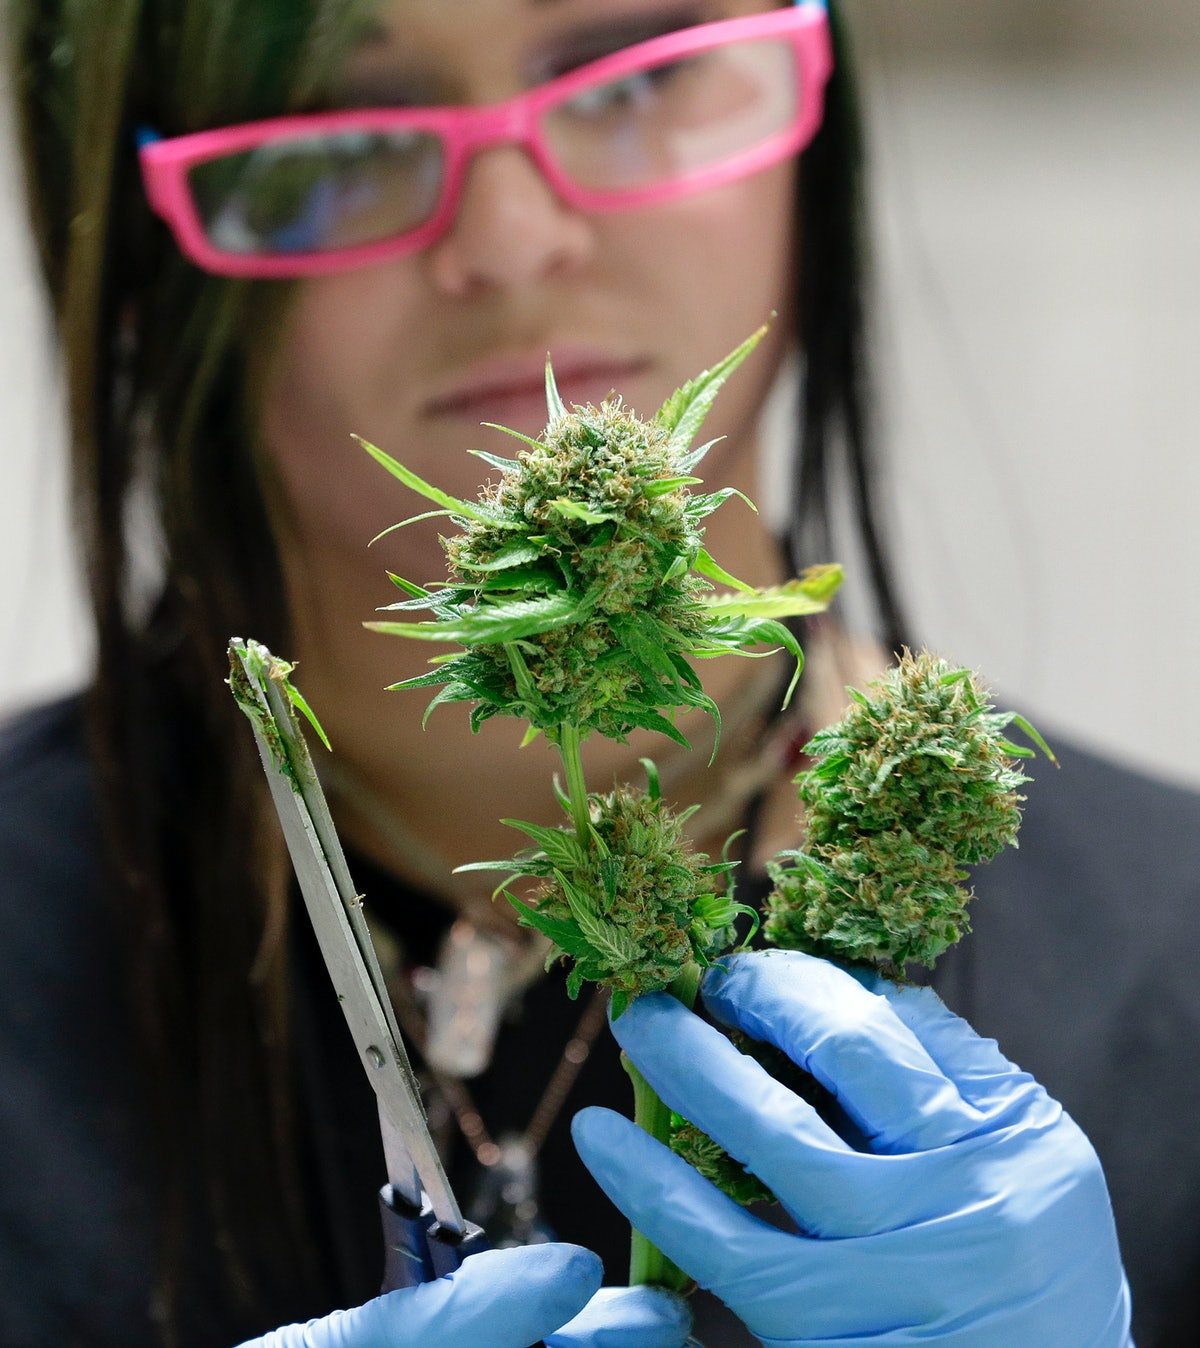 Марихуана восприятие марихуан гашиш конопля